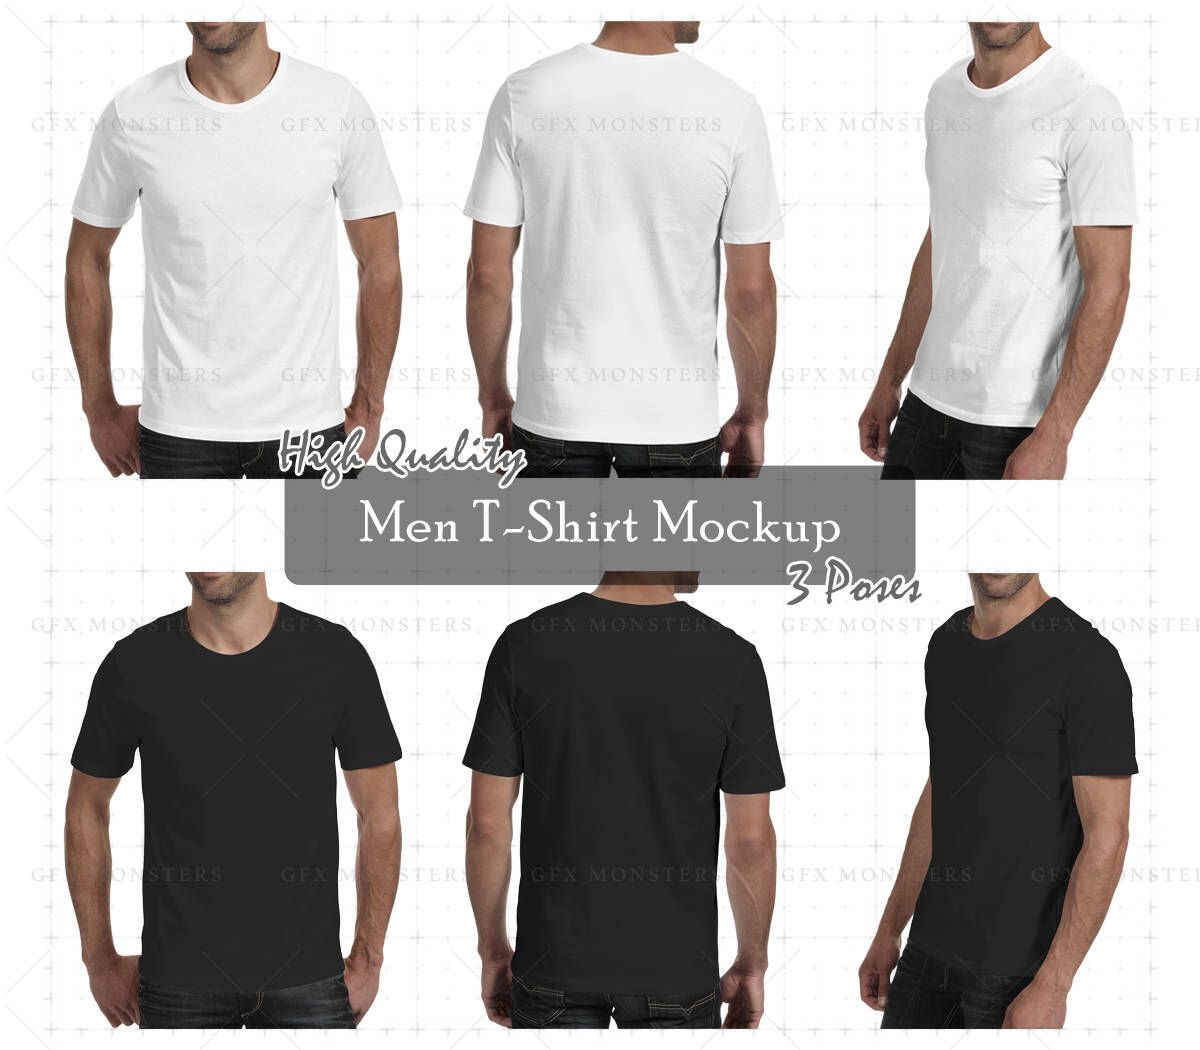 Download Men T Shirt Mockup Psd Front Back Perspective Png Psd Apparel Mock Up High Resolution Mock Up Instant Download Kaos Desain Pakaian Ide Kostum